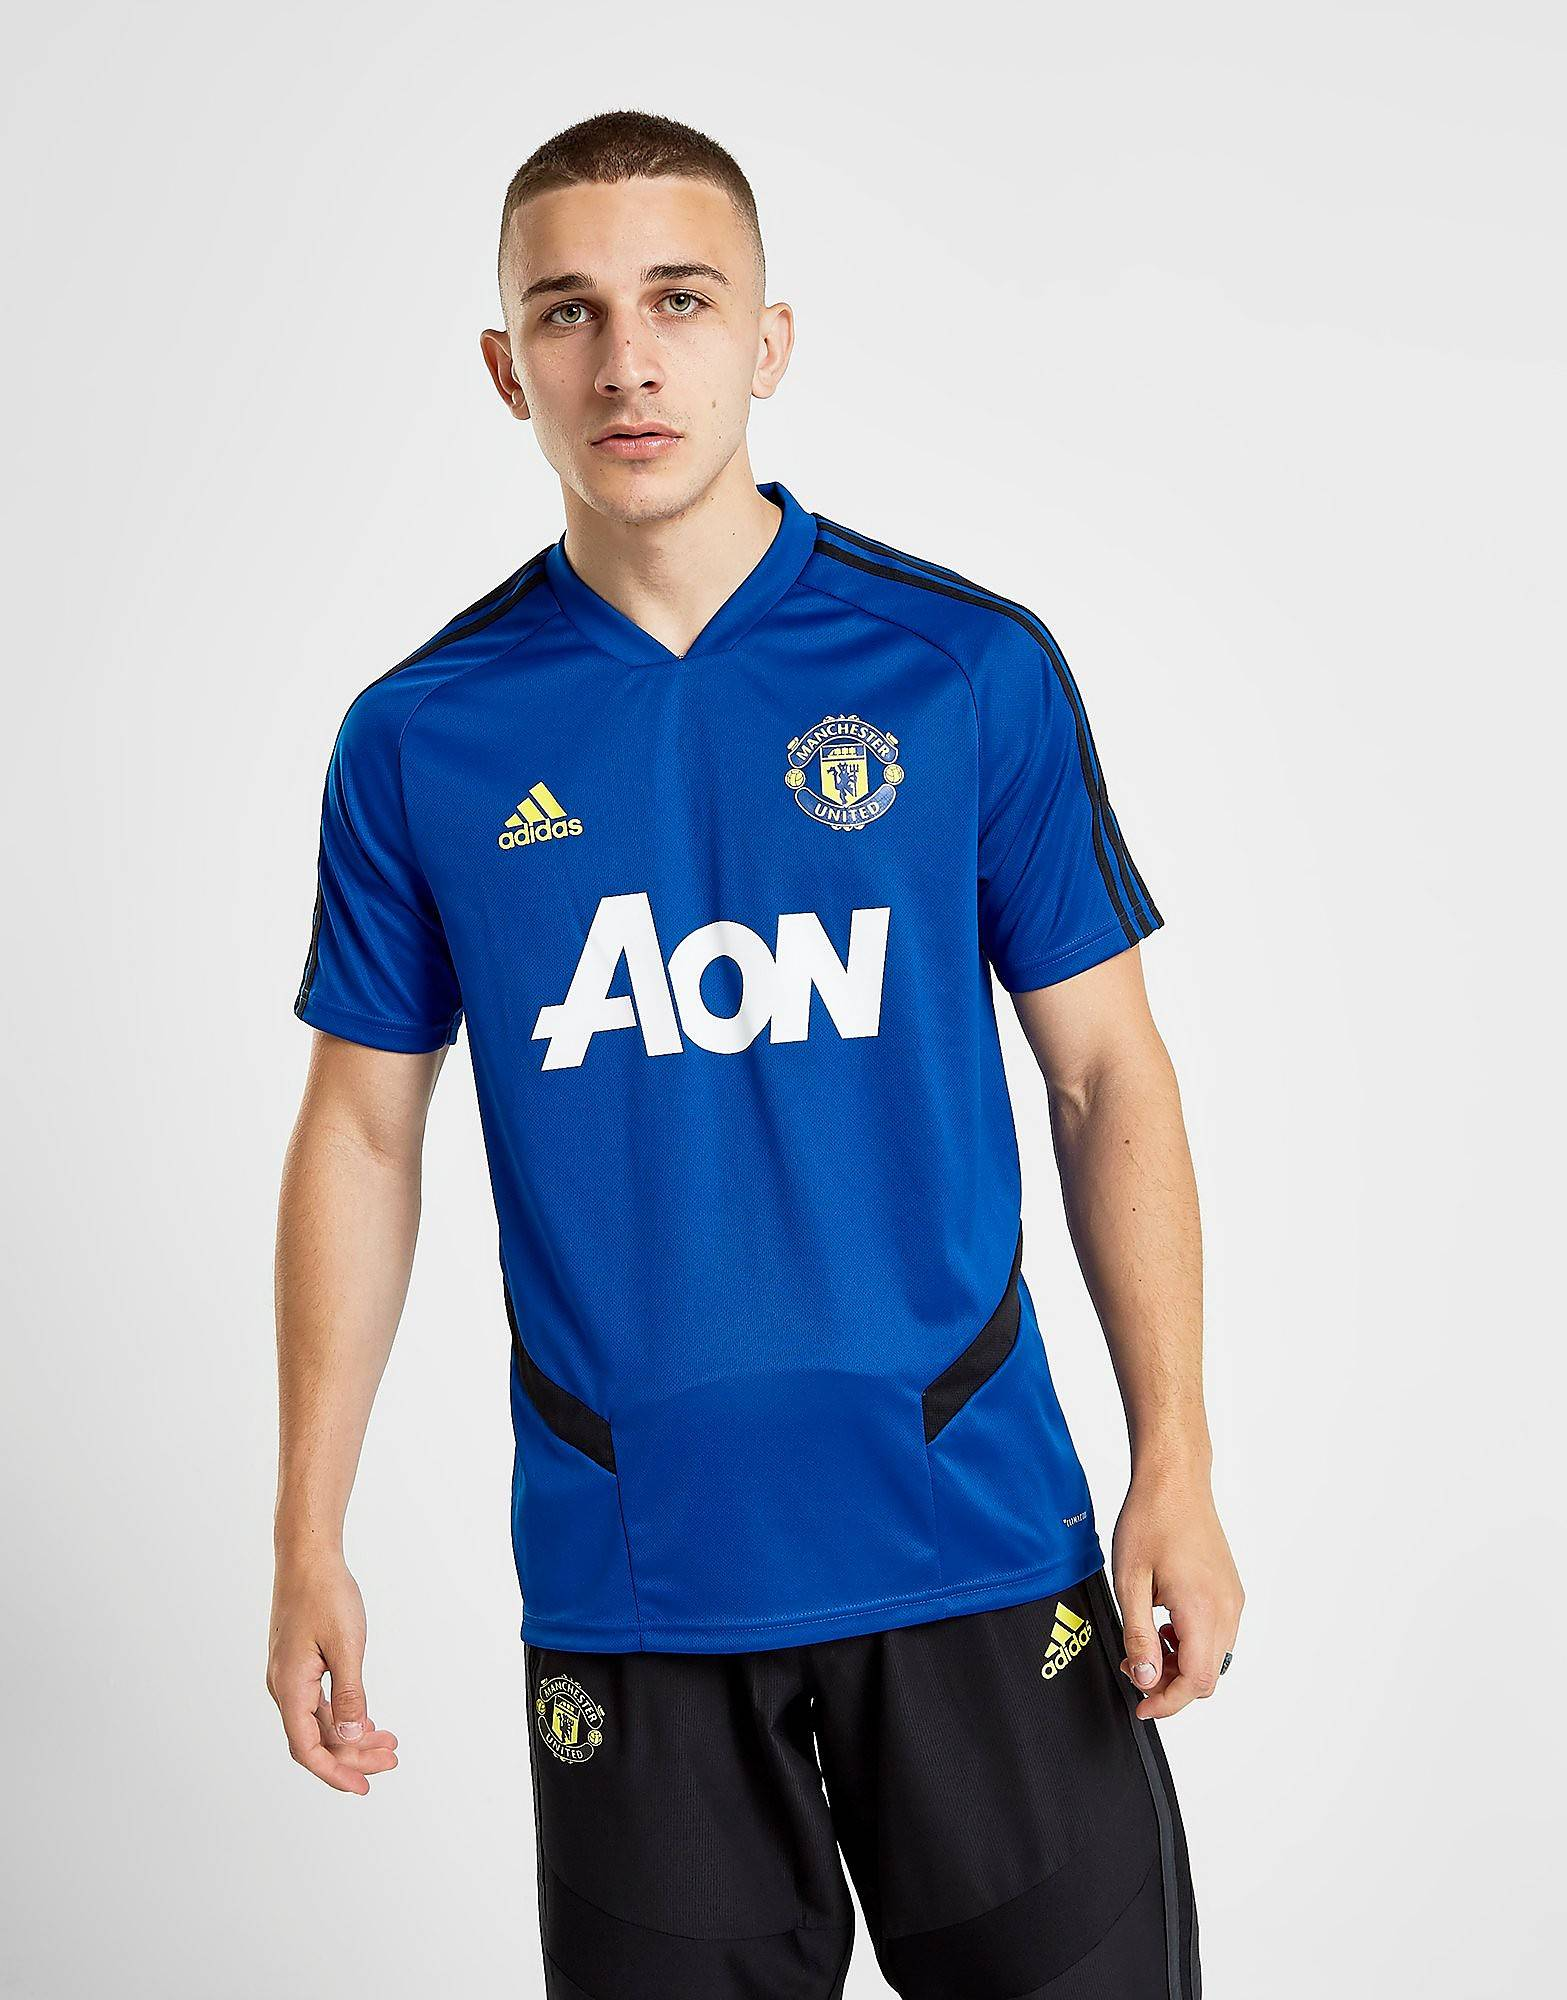 Image of Adidas Manchester United FC Treenipaita Miehet - Mens, Sininen